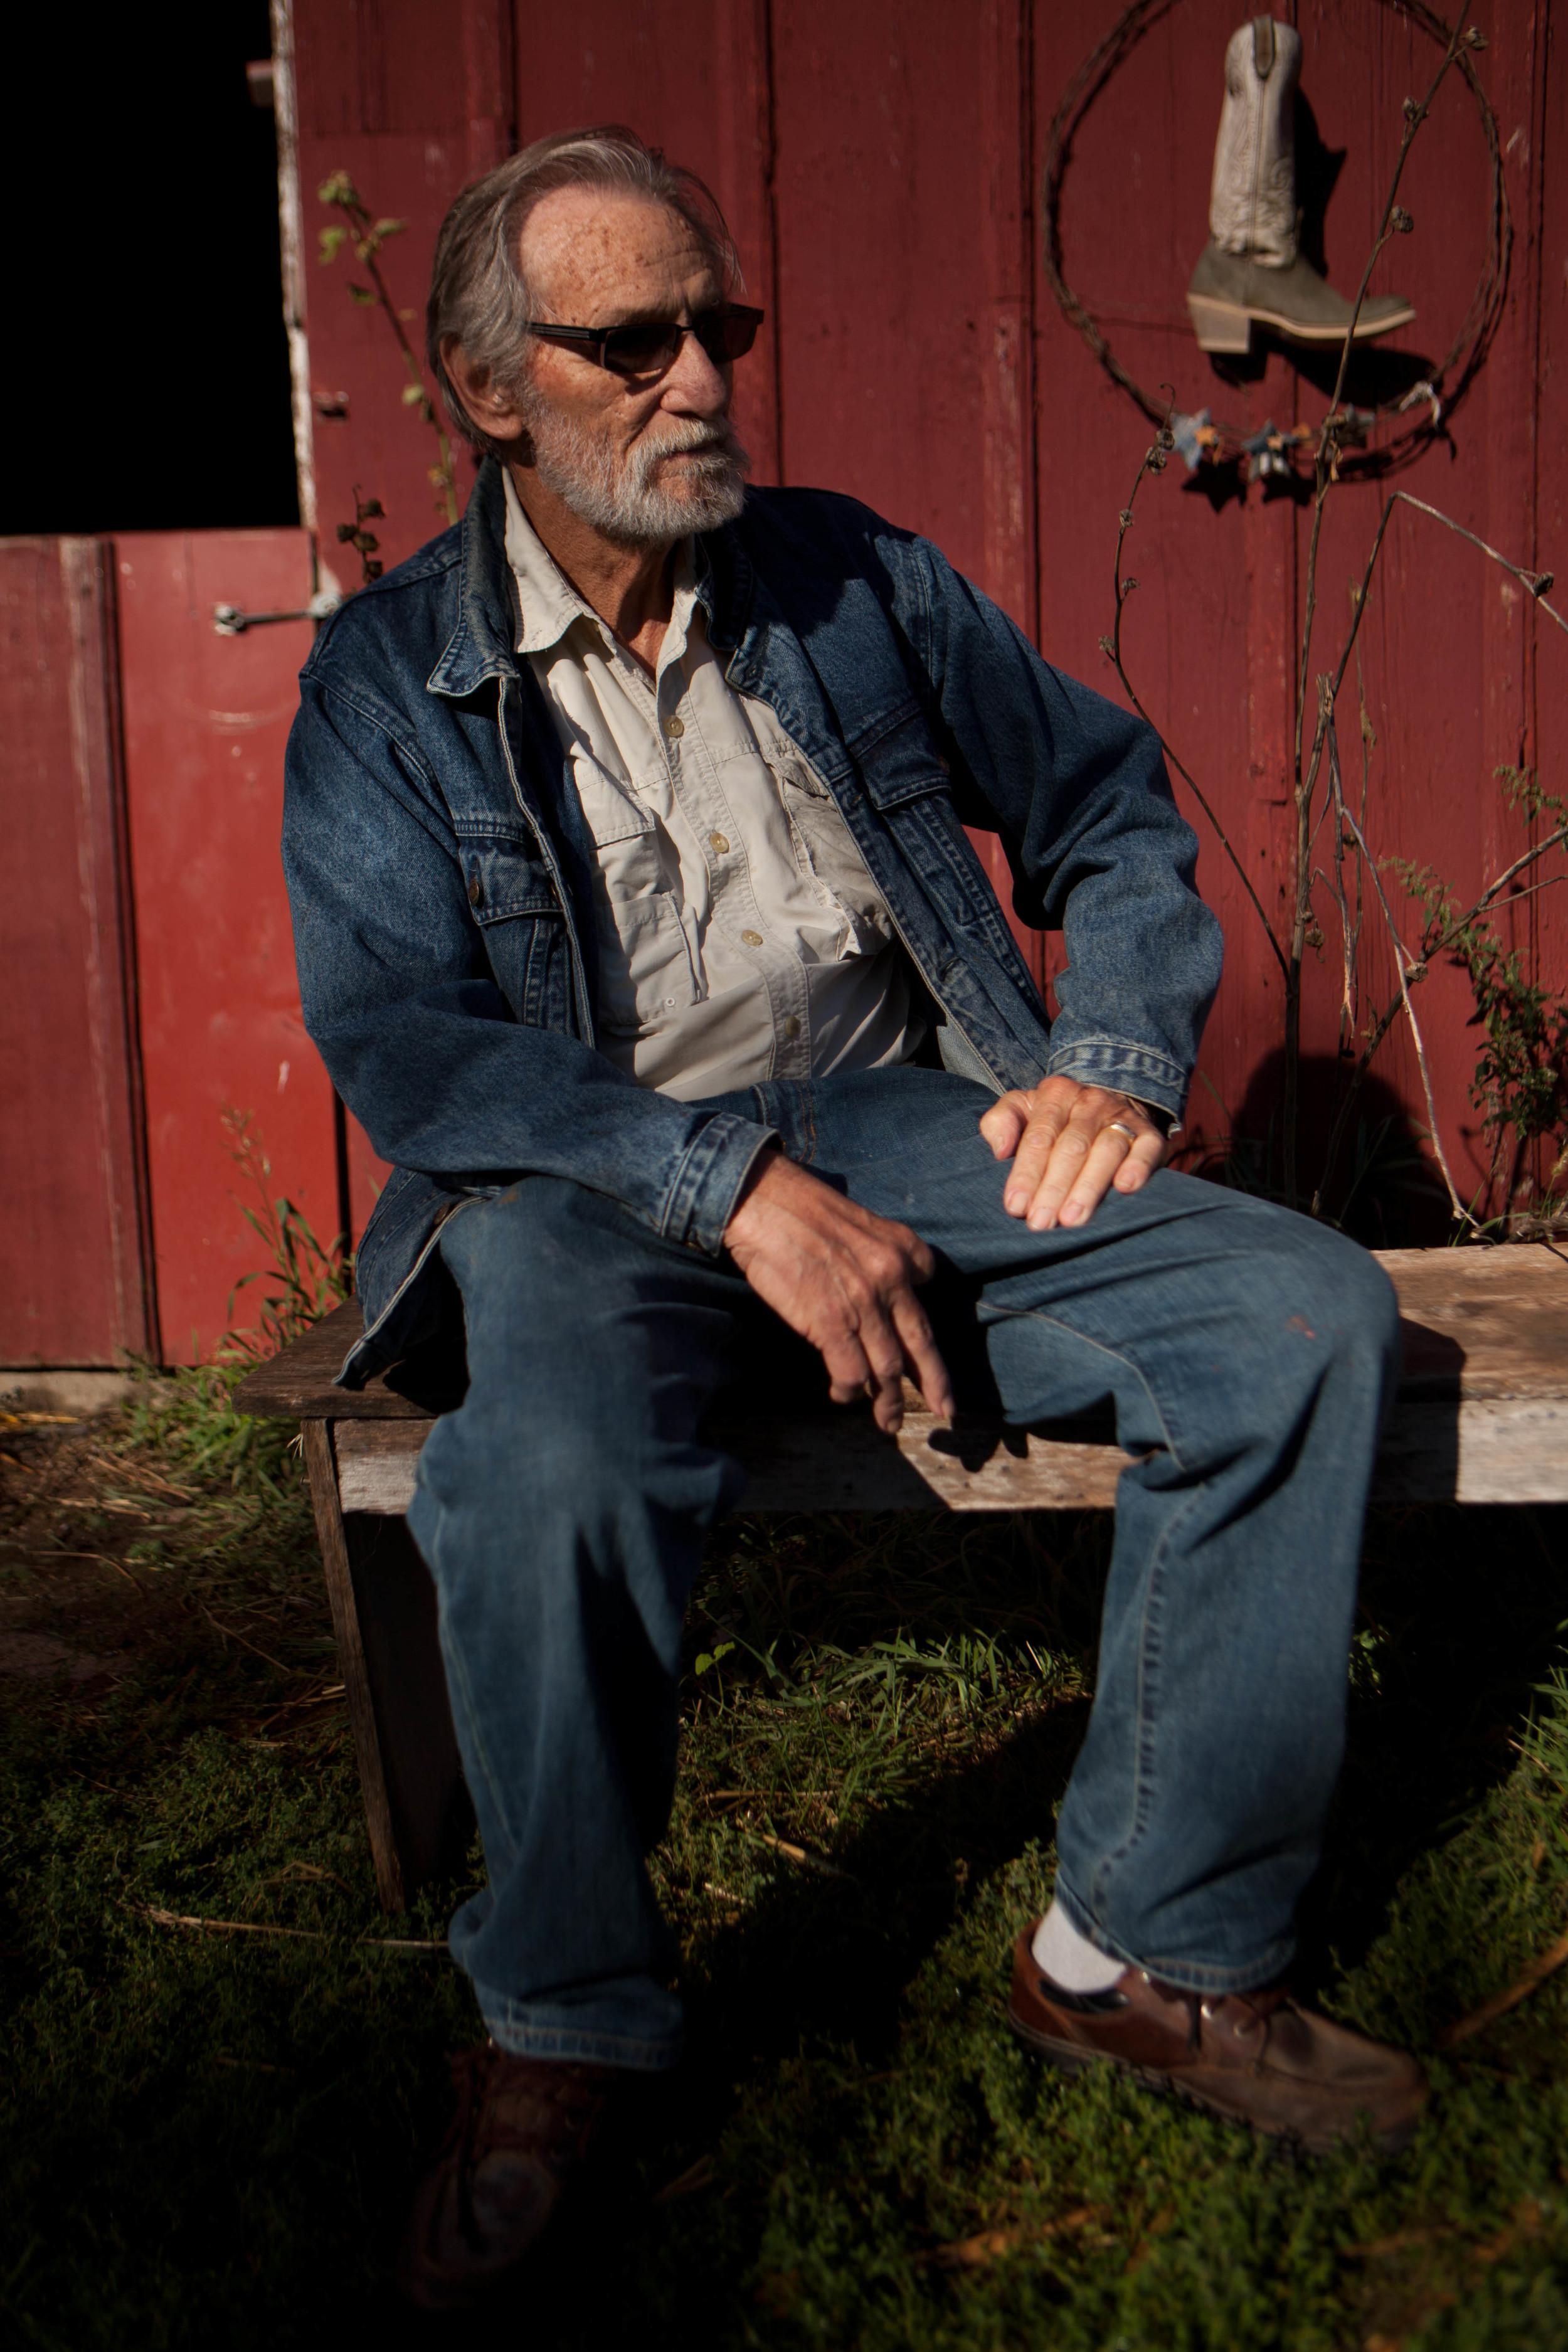 Calhoun County Farmer D.G. Partridge